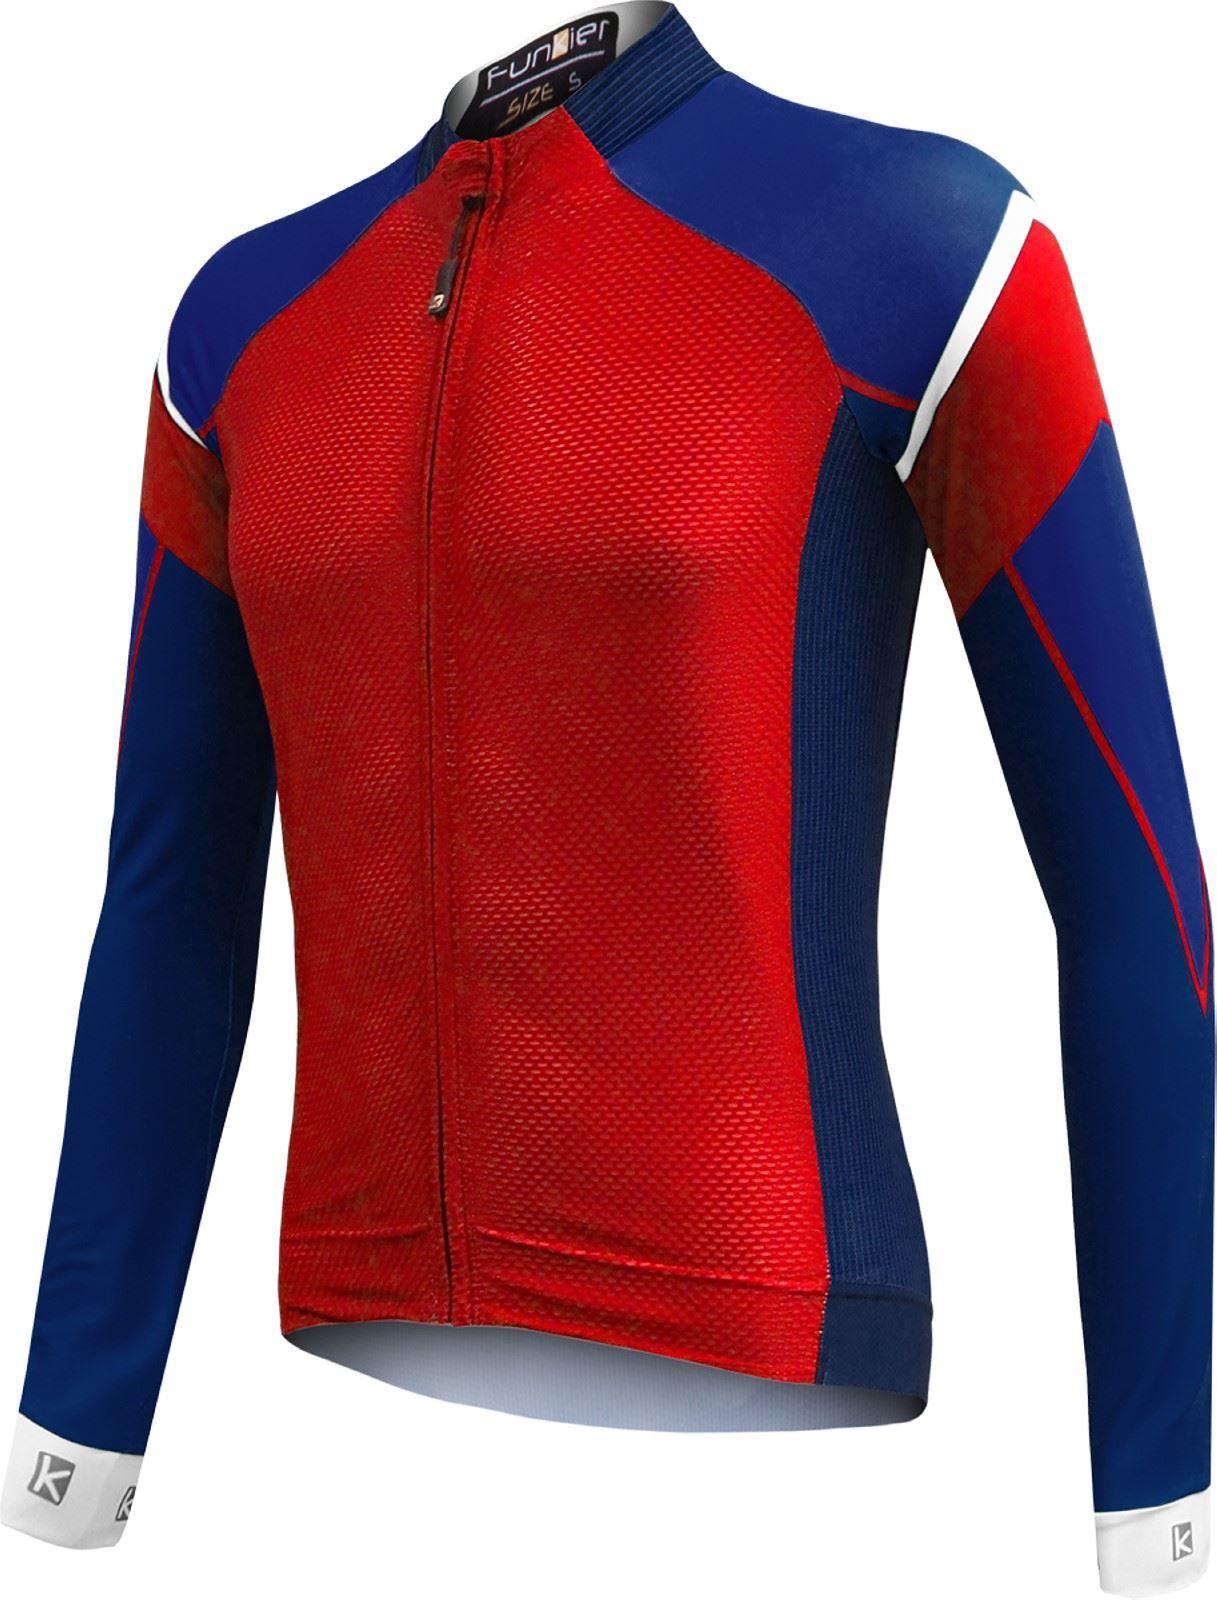 Long sleeve jersey funkier isparo homme elite rouge bleu (j-801-lw) xxx-grand